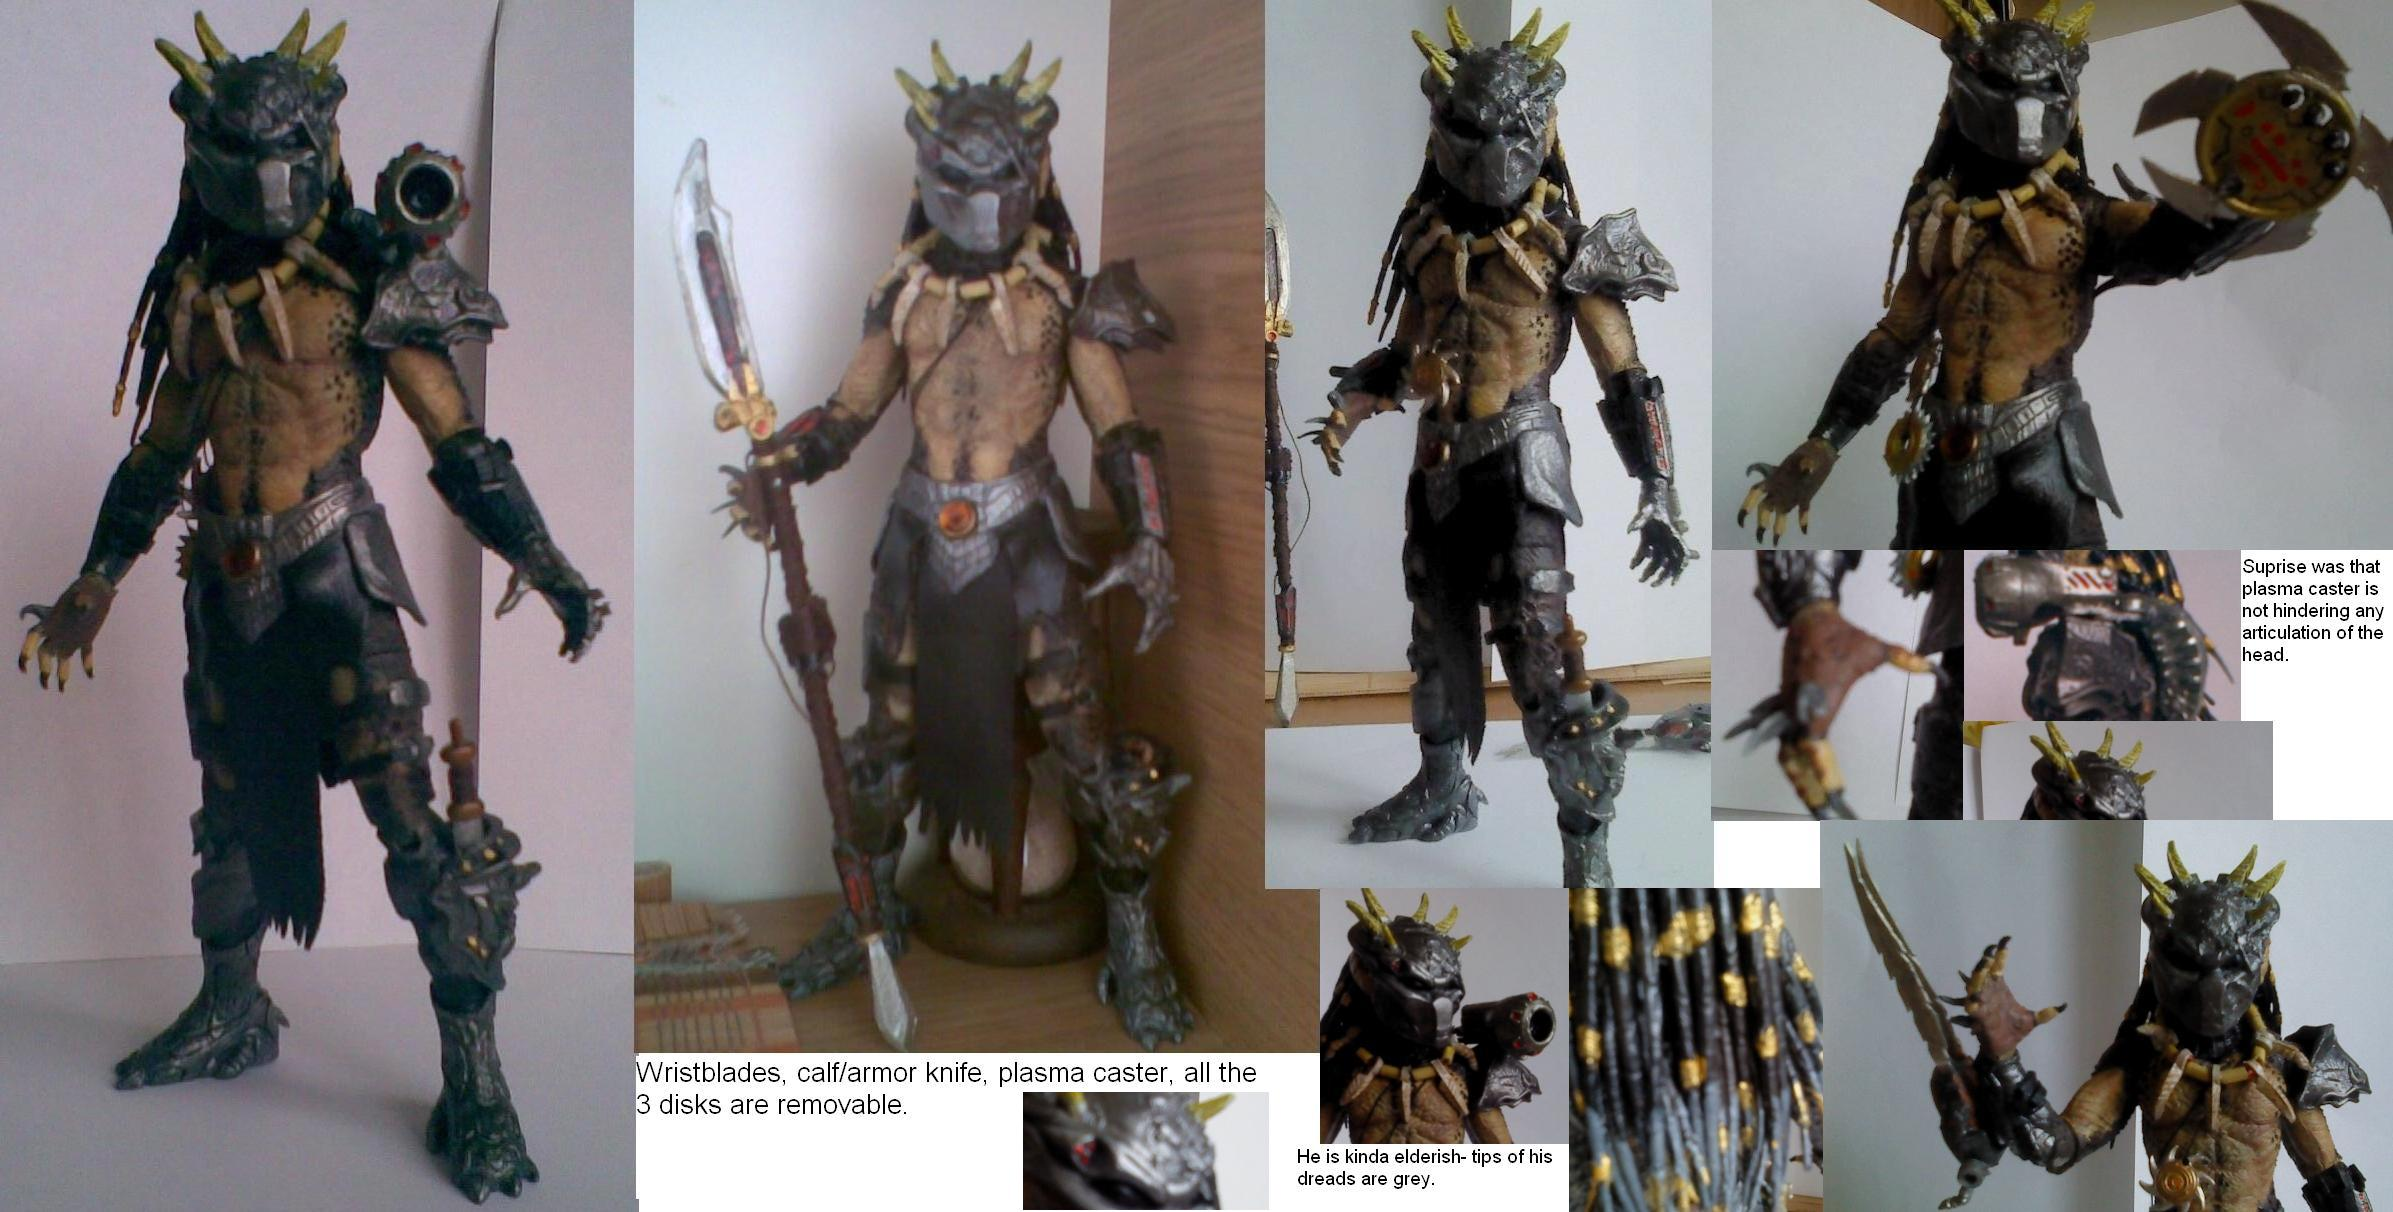 http://fc03.deviantart.net/fs71/f/2012/126/4/b/hate_predator_custom_figure_99__finished_by_bender18-d4yq0zg.jpg